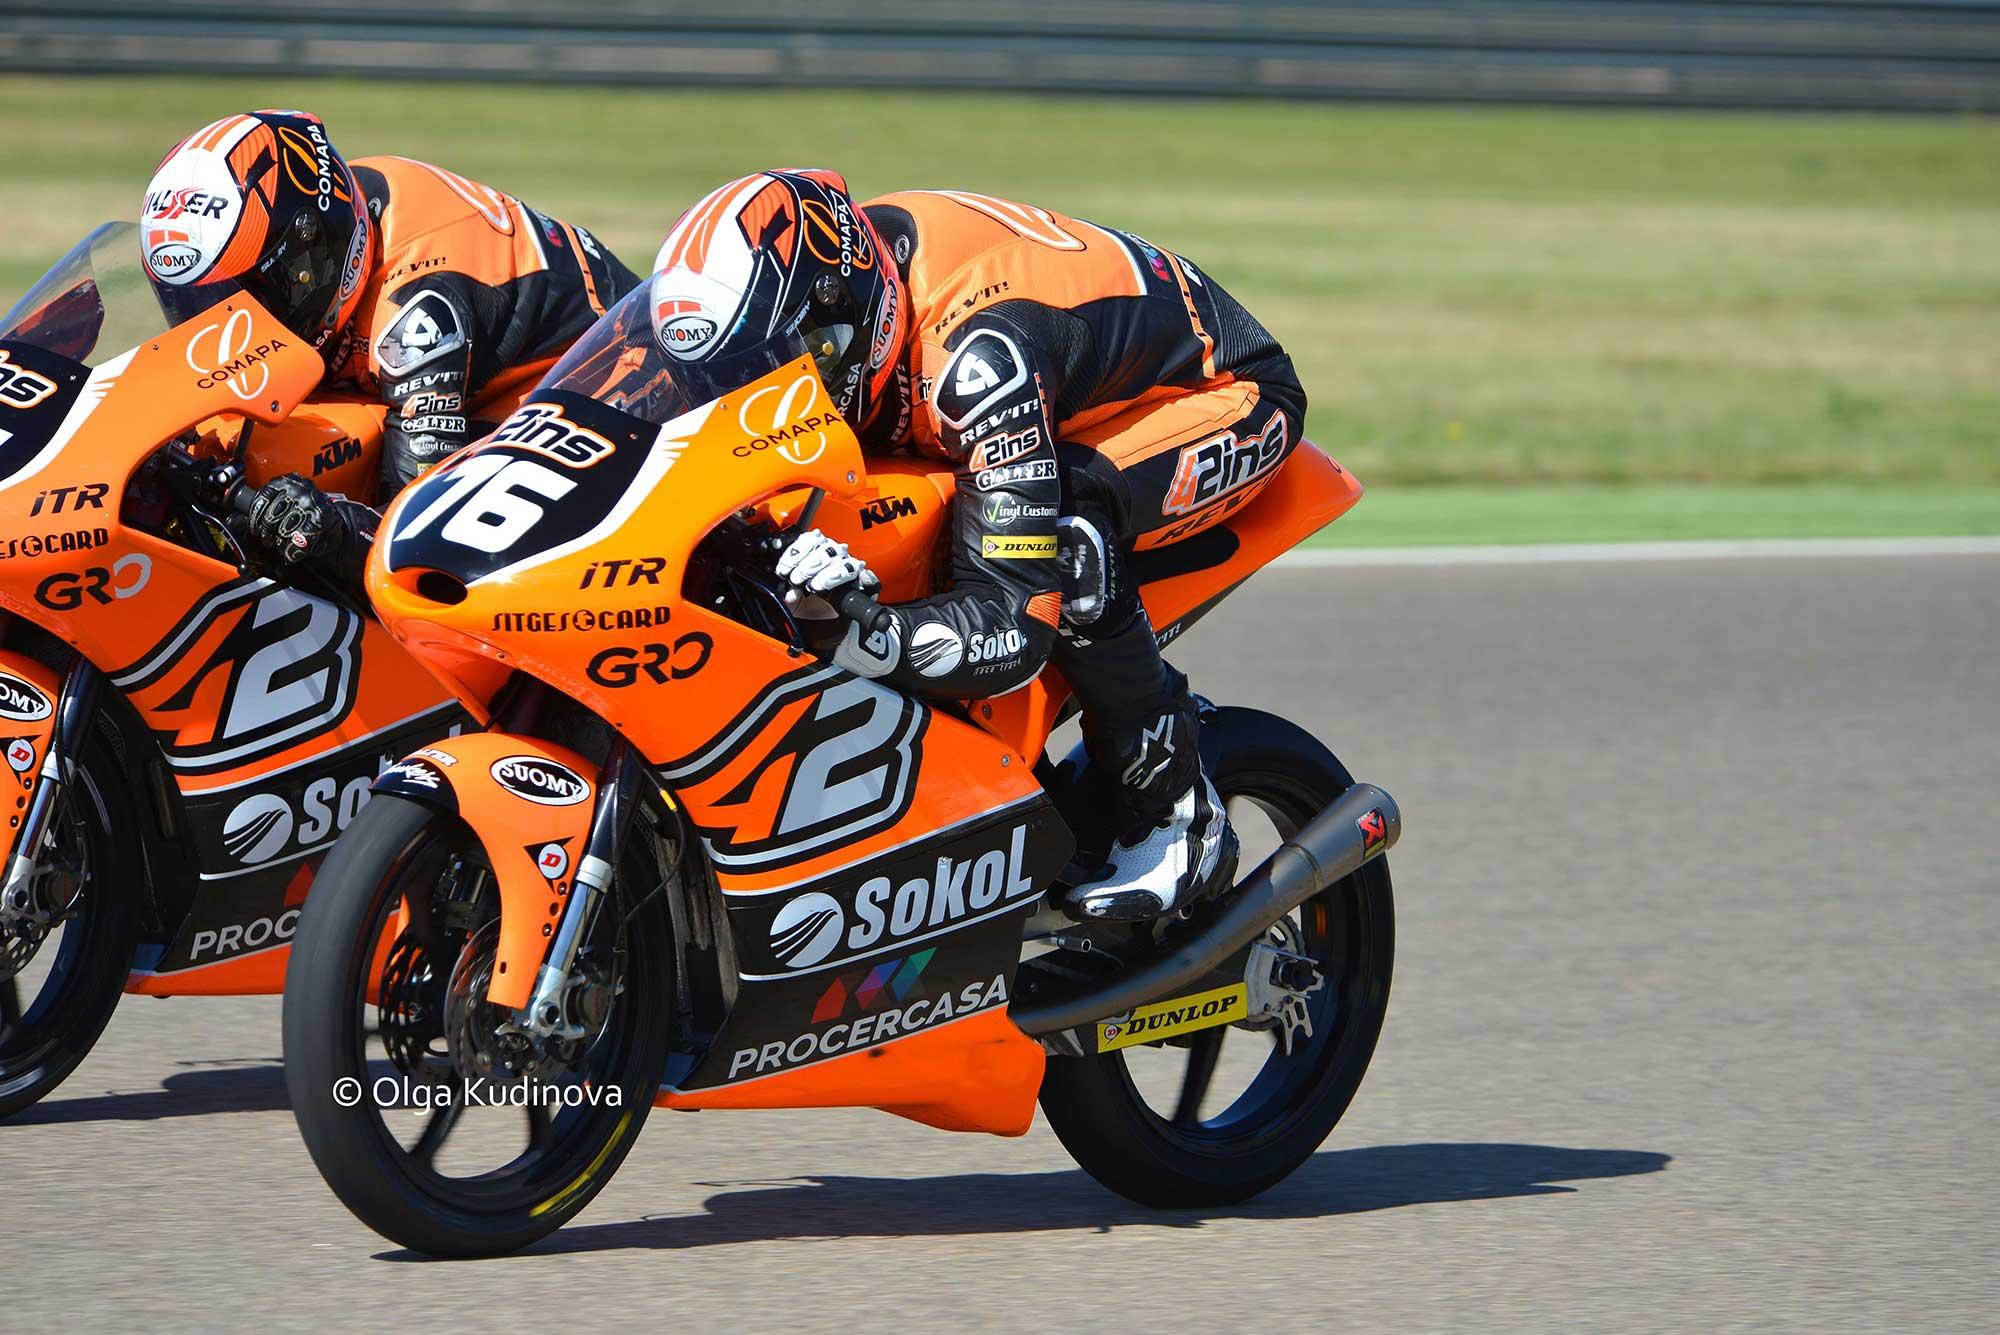 FIM Junior Moto3 rider Makar Yurchenko